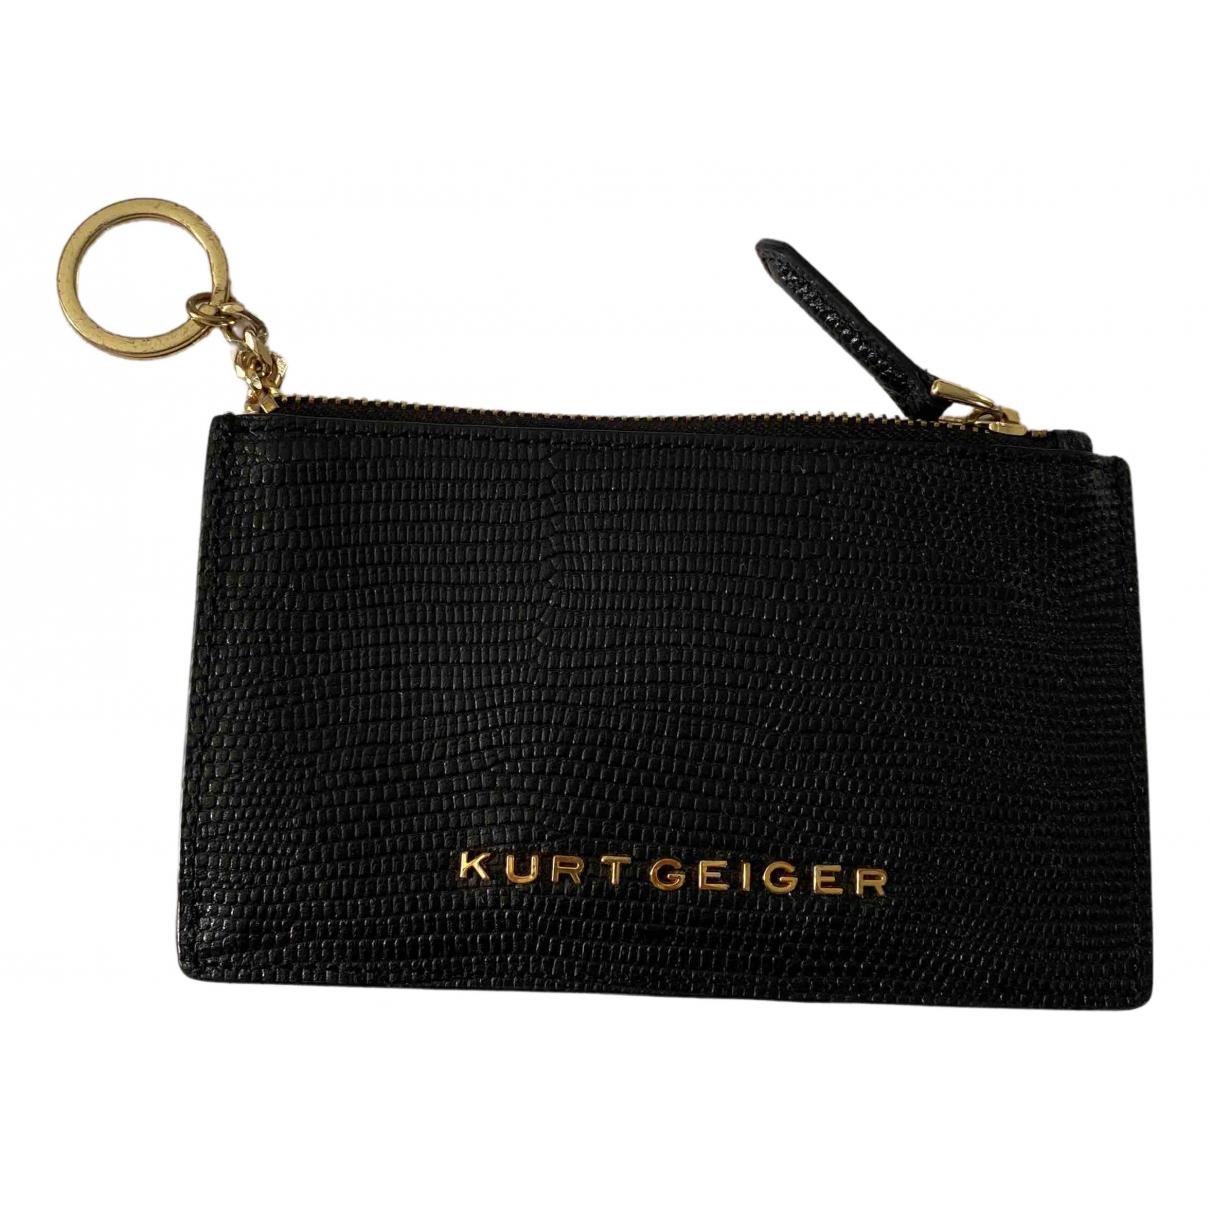 Kurt Geiger - Portefeuille   pour femme en cuir - noir